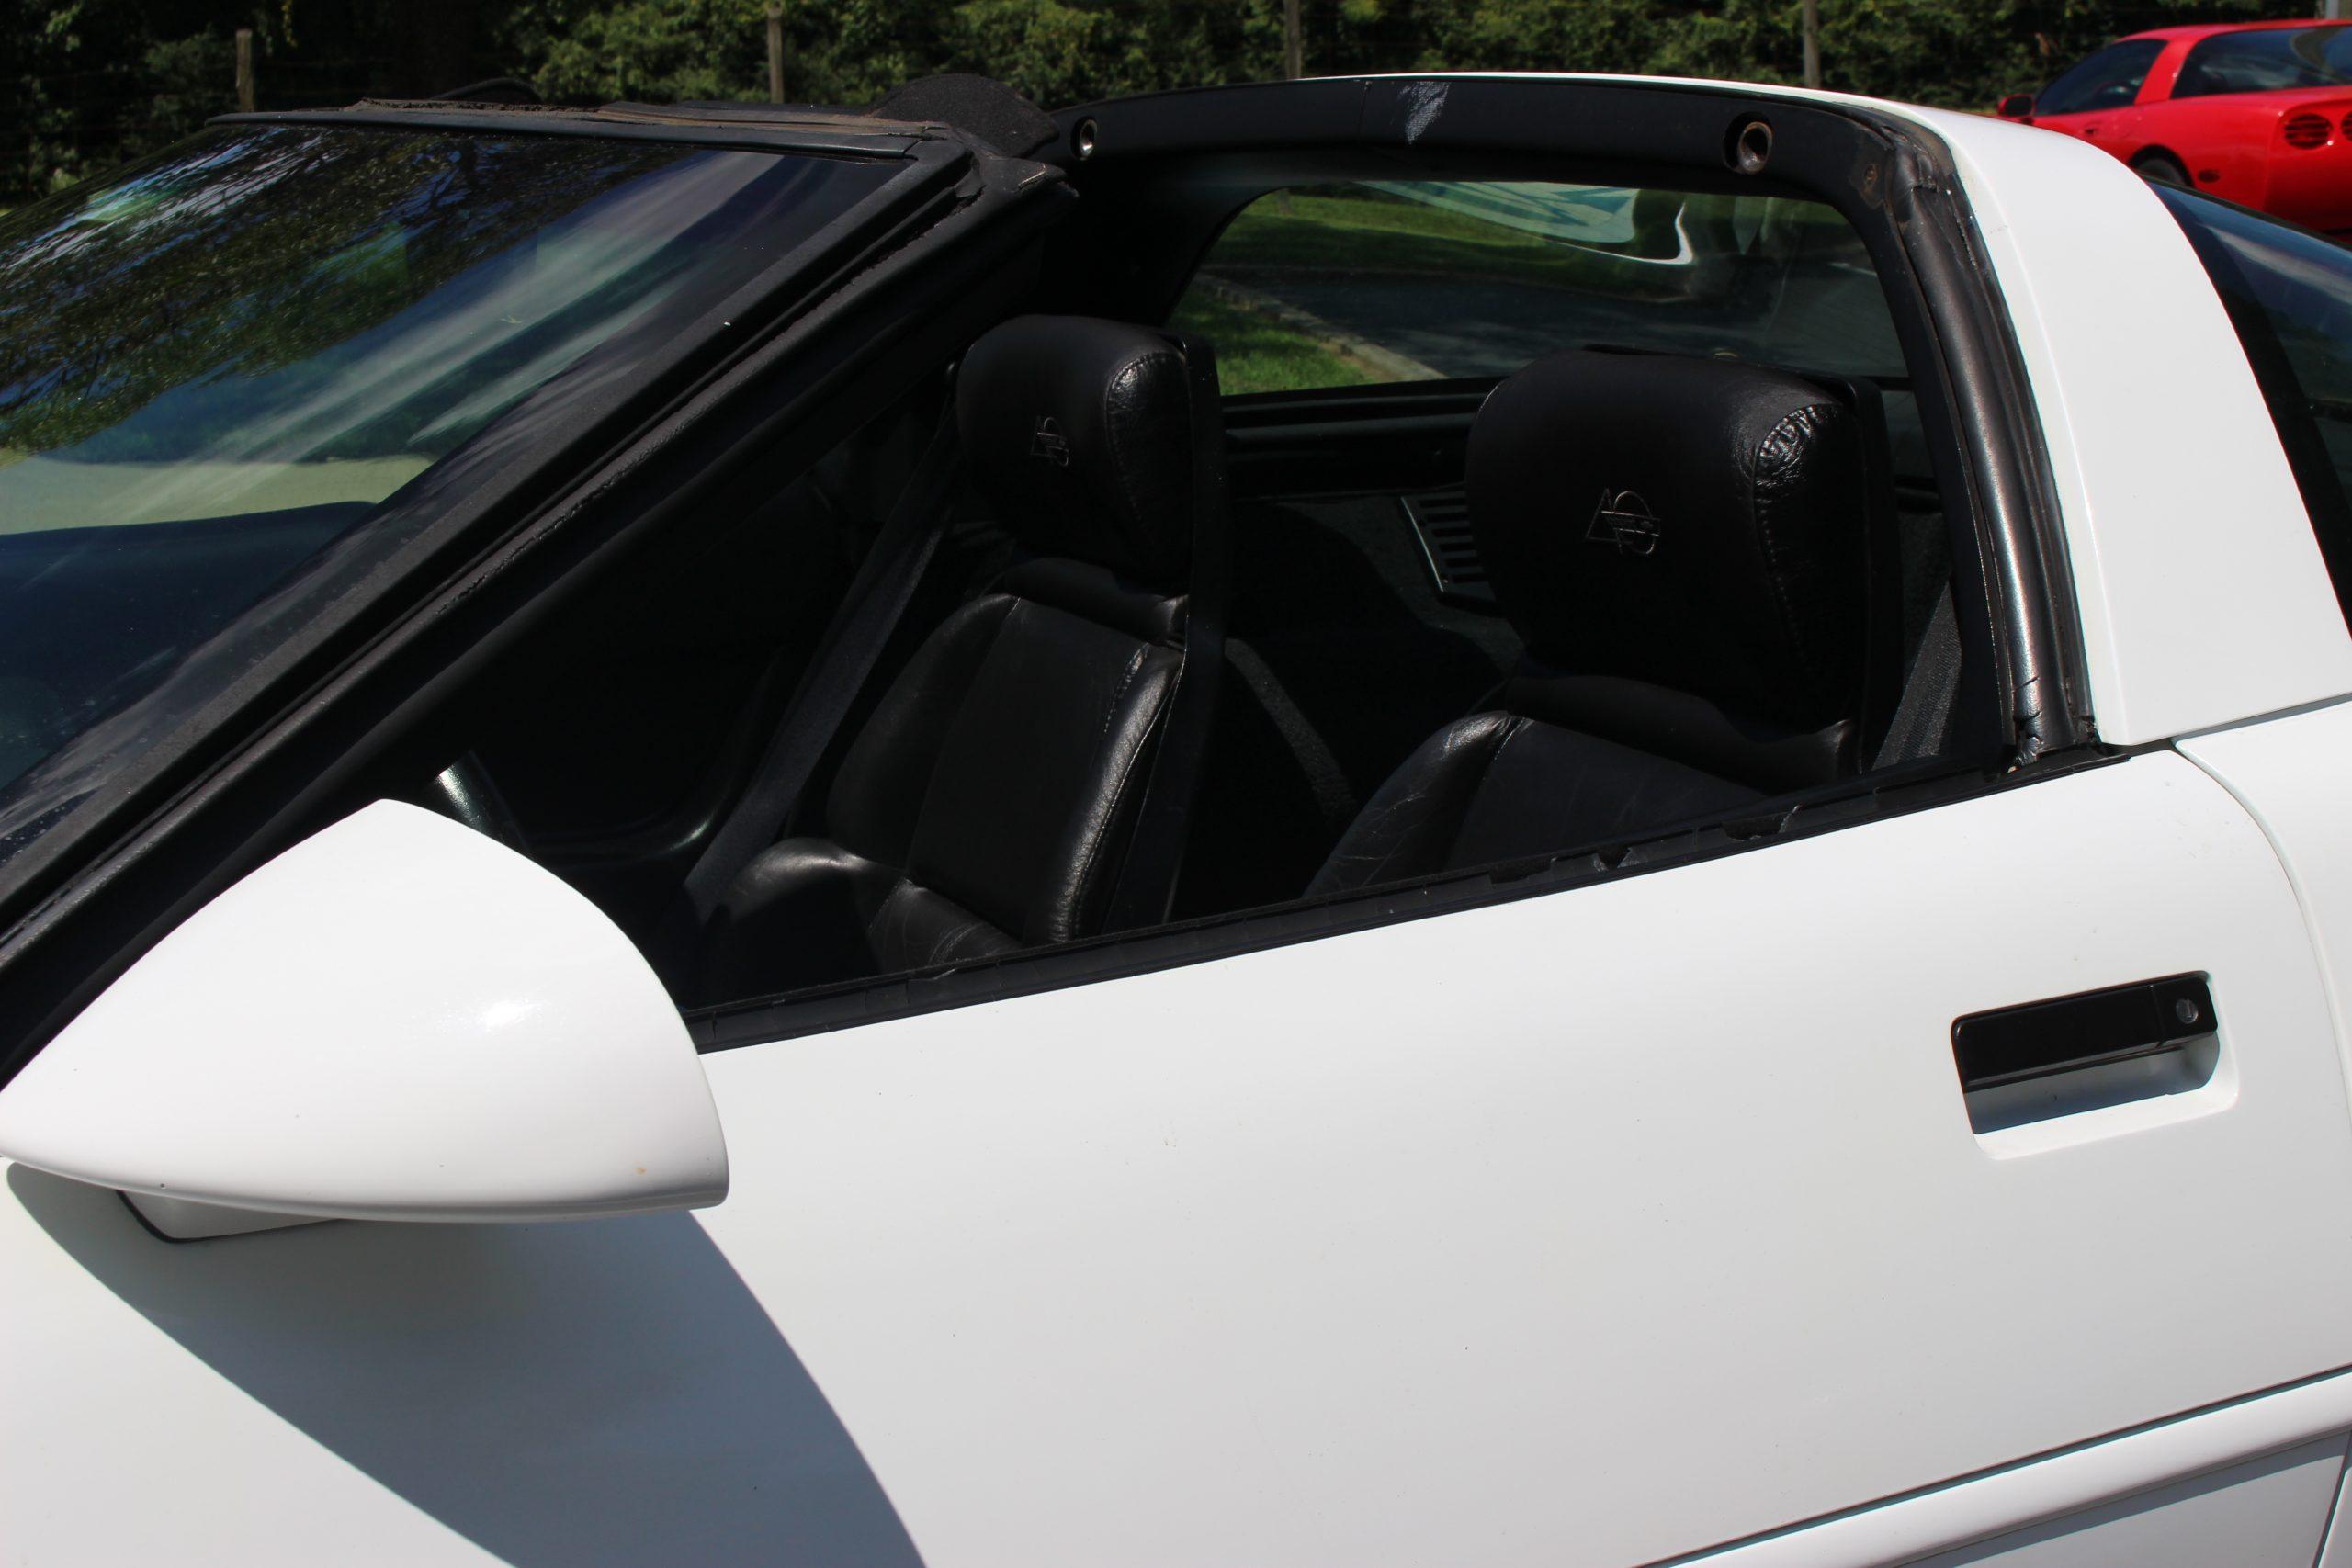 1984 1996 Corvette Door Outer Window Seal Replacement Corvette Magazine Corvette How To S Technical Articles